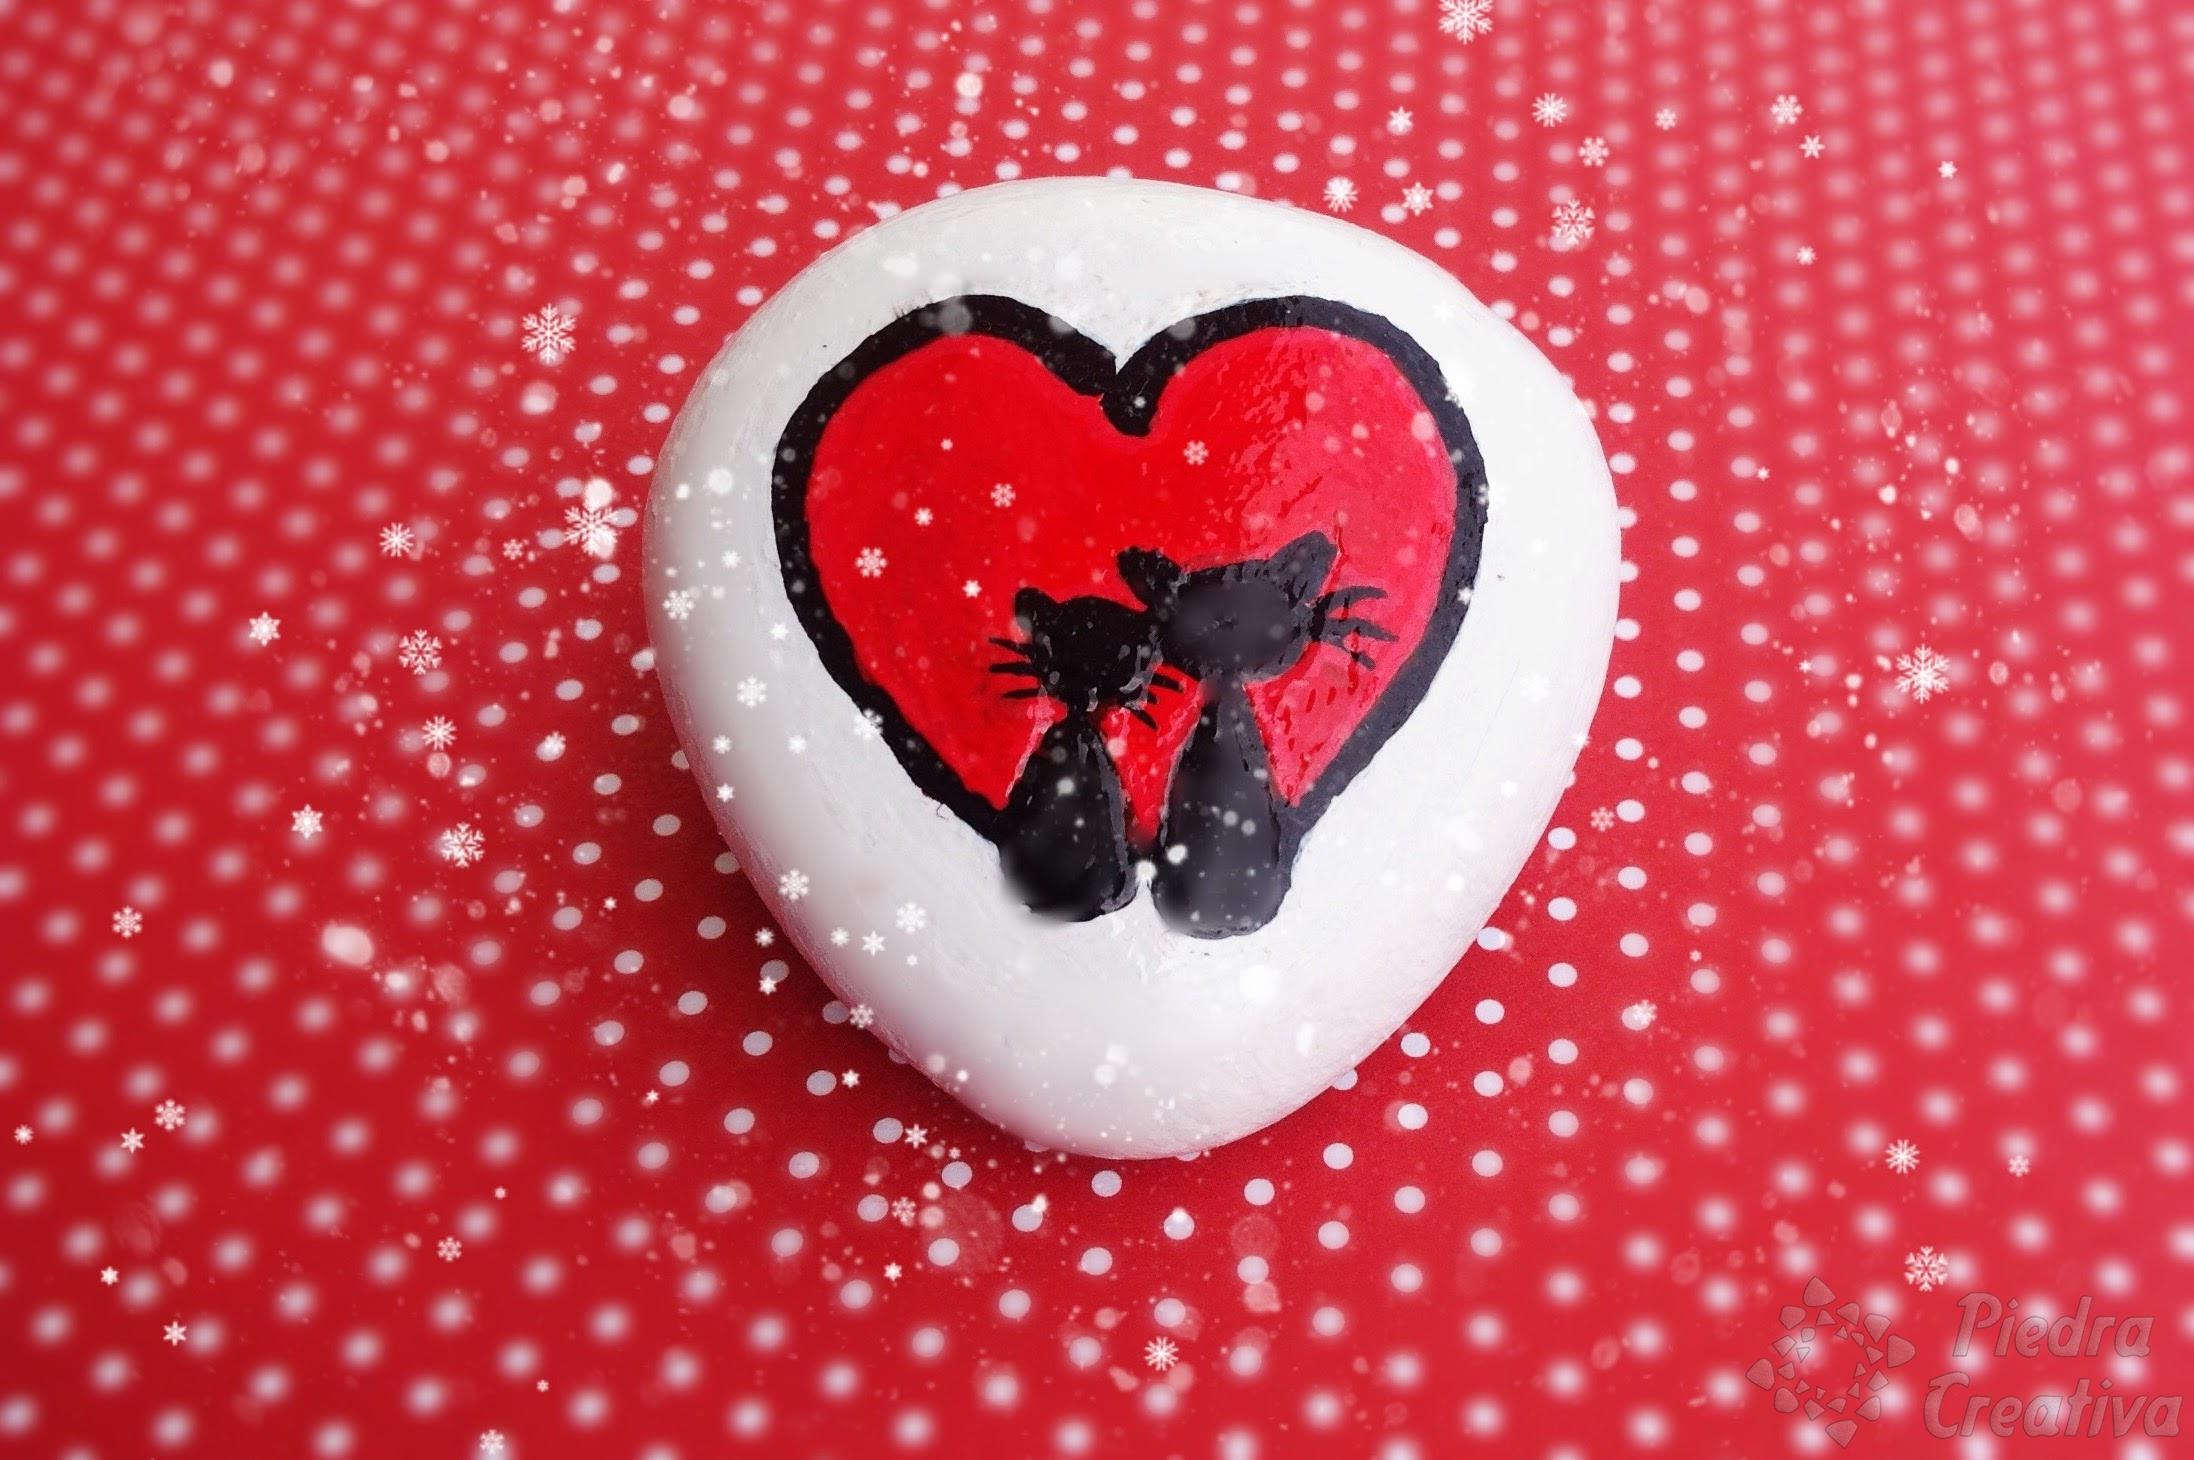 painting a heart of stone u2022 diy in piedracreativa